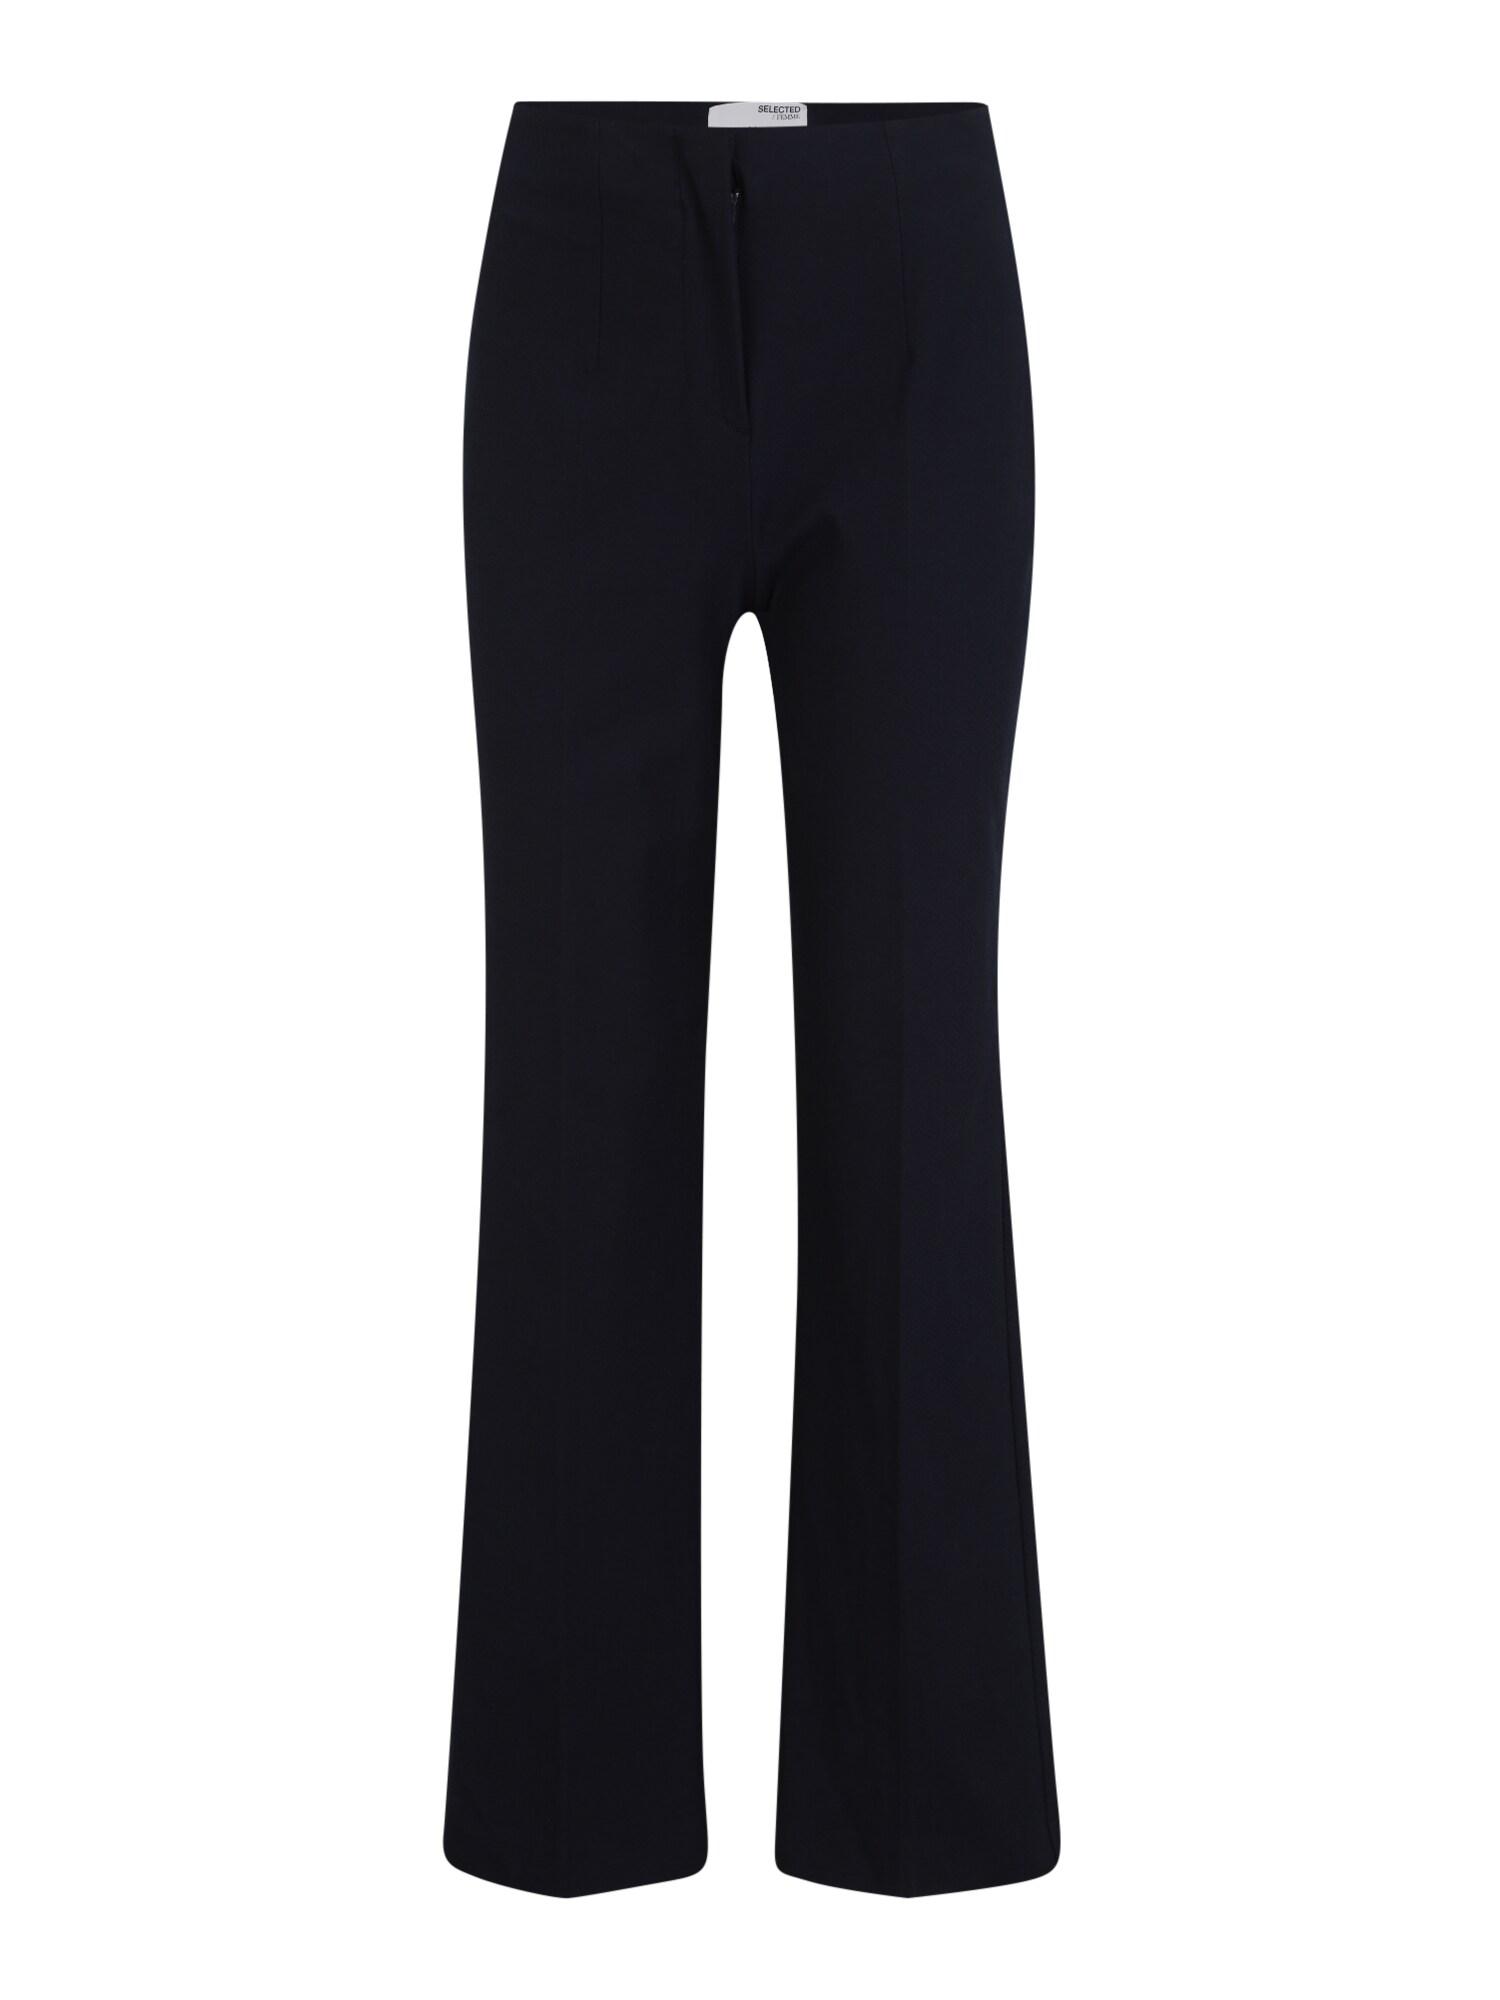 Selected Femme (Tall) Kelnės su kantu 'LINA' ultramarino mėlyna (skaidri)